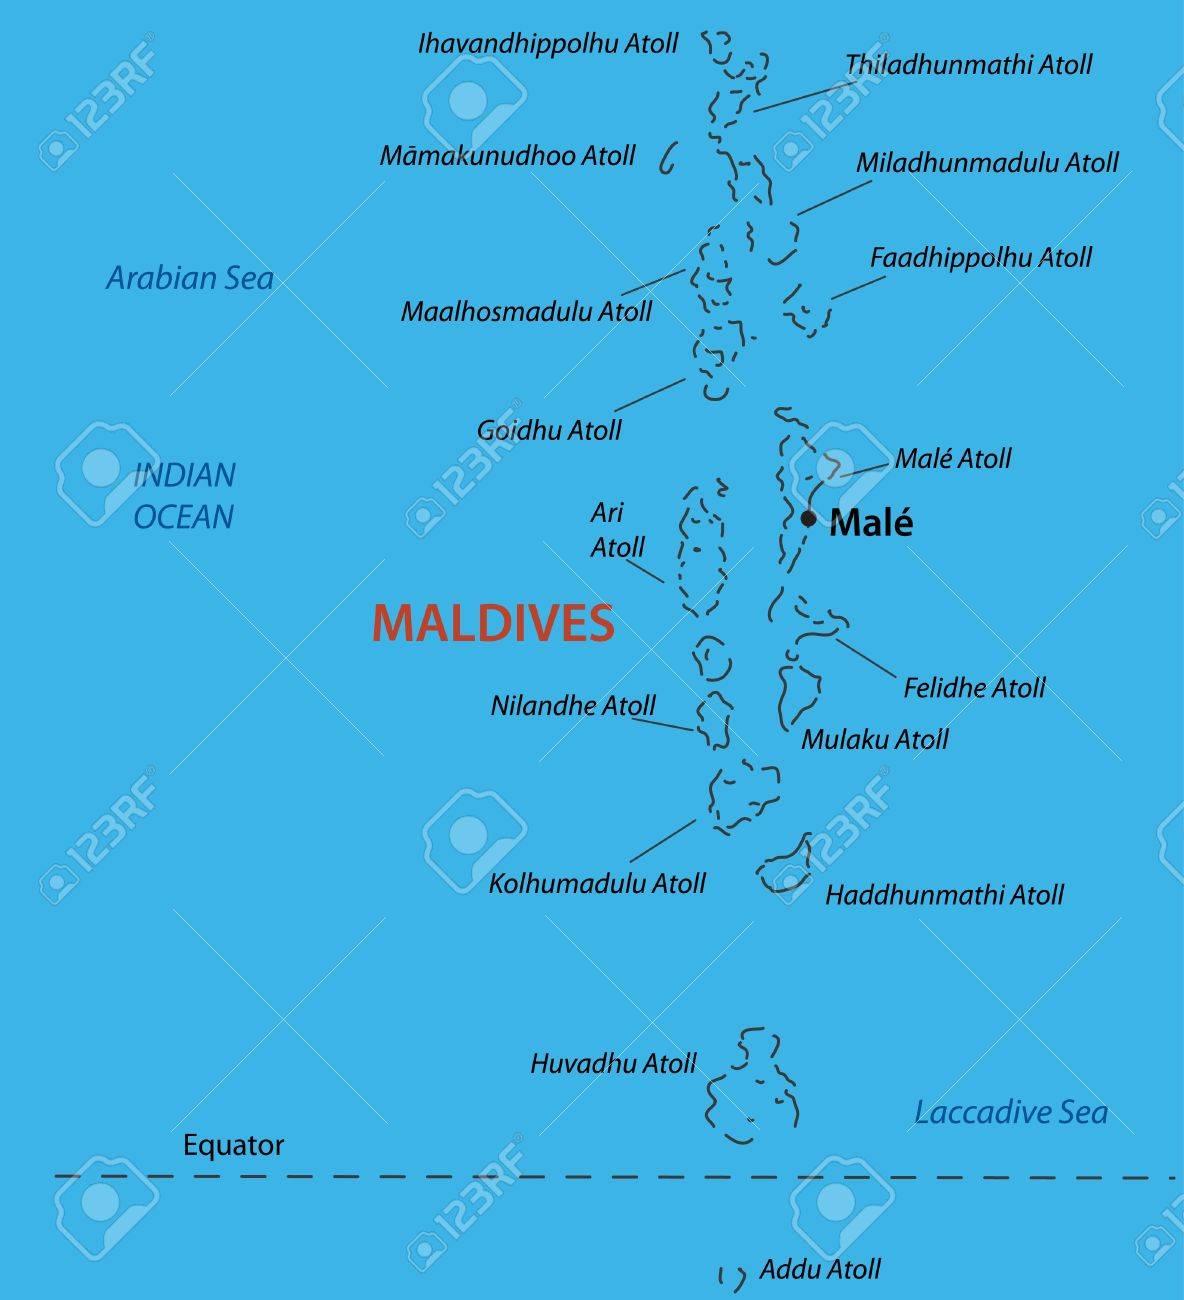 Republic Of The Maldives Vector Map Royalty Free Cliparts - Republic of maldives map